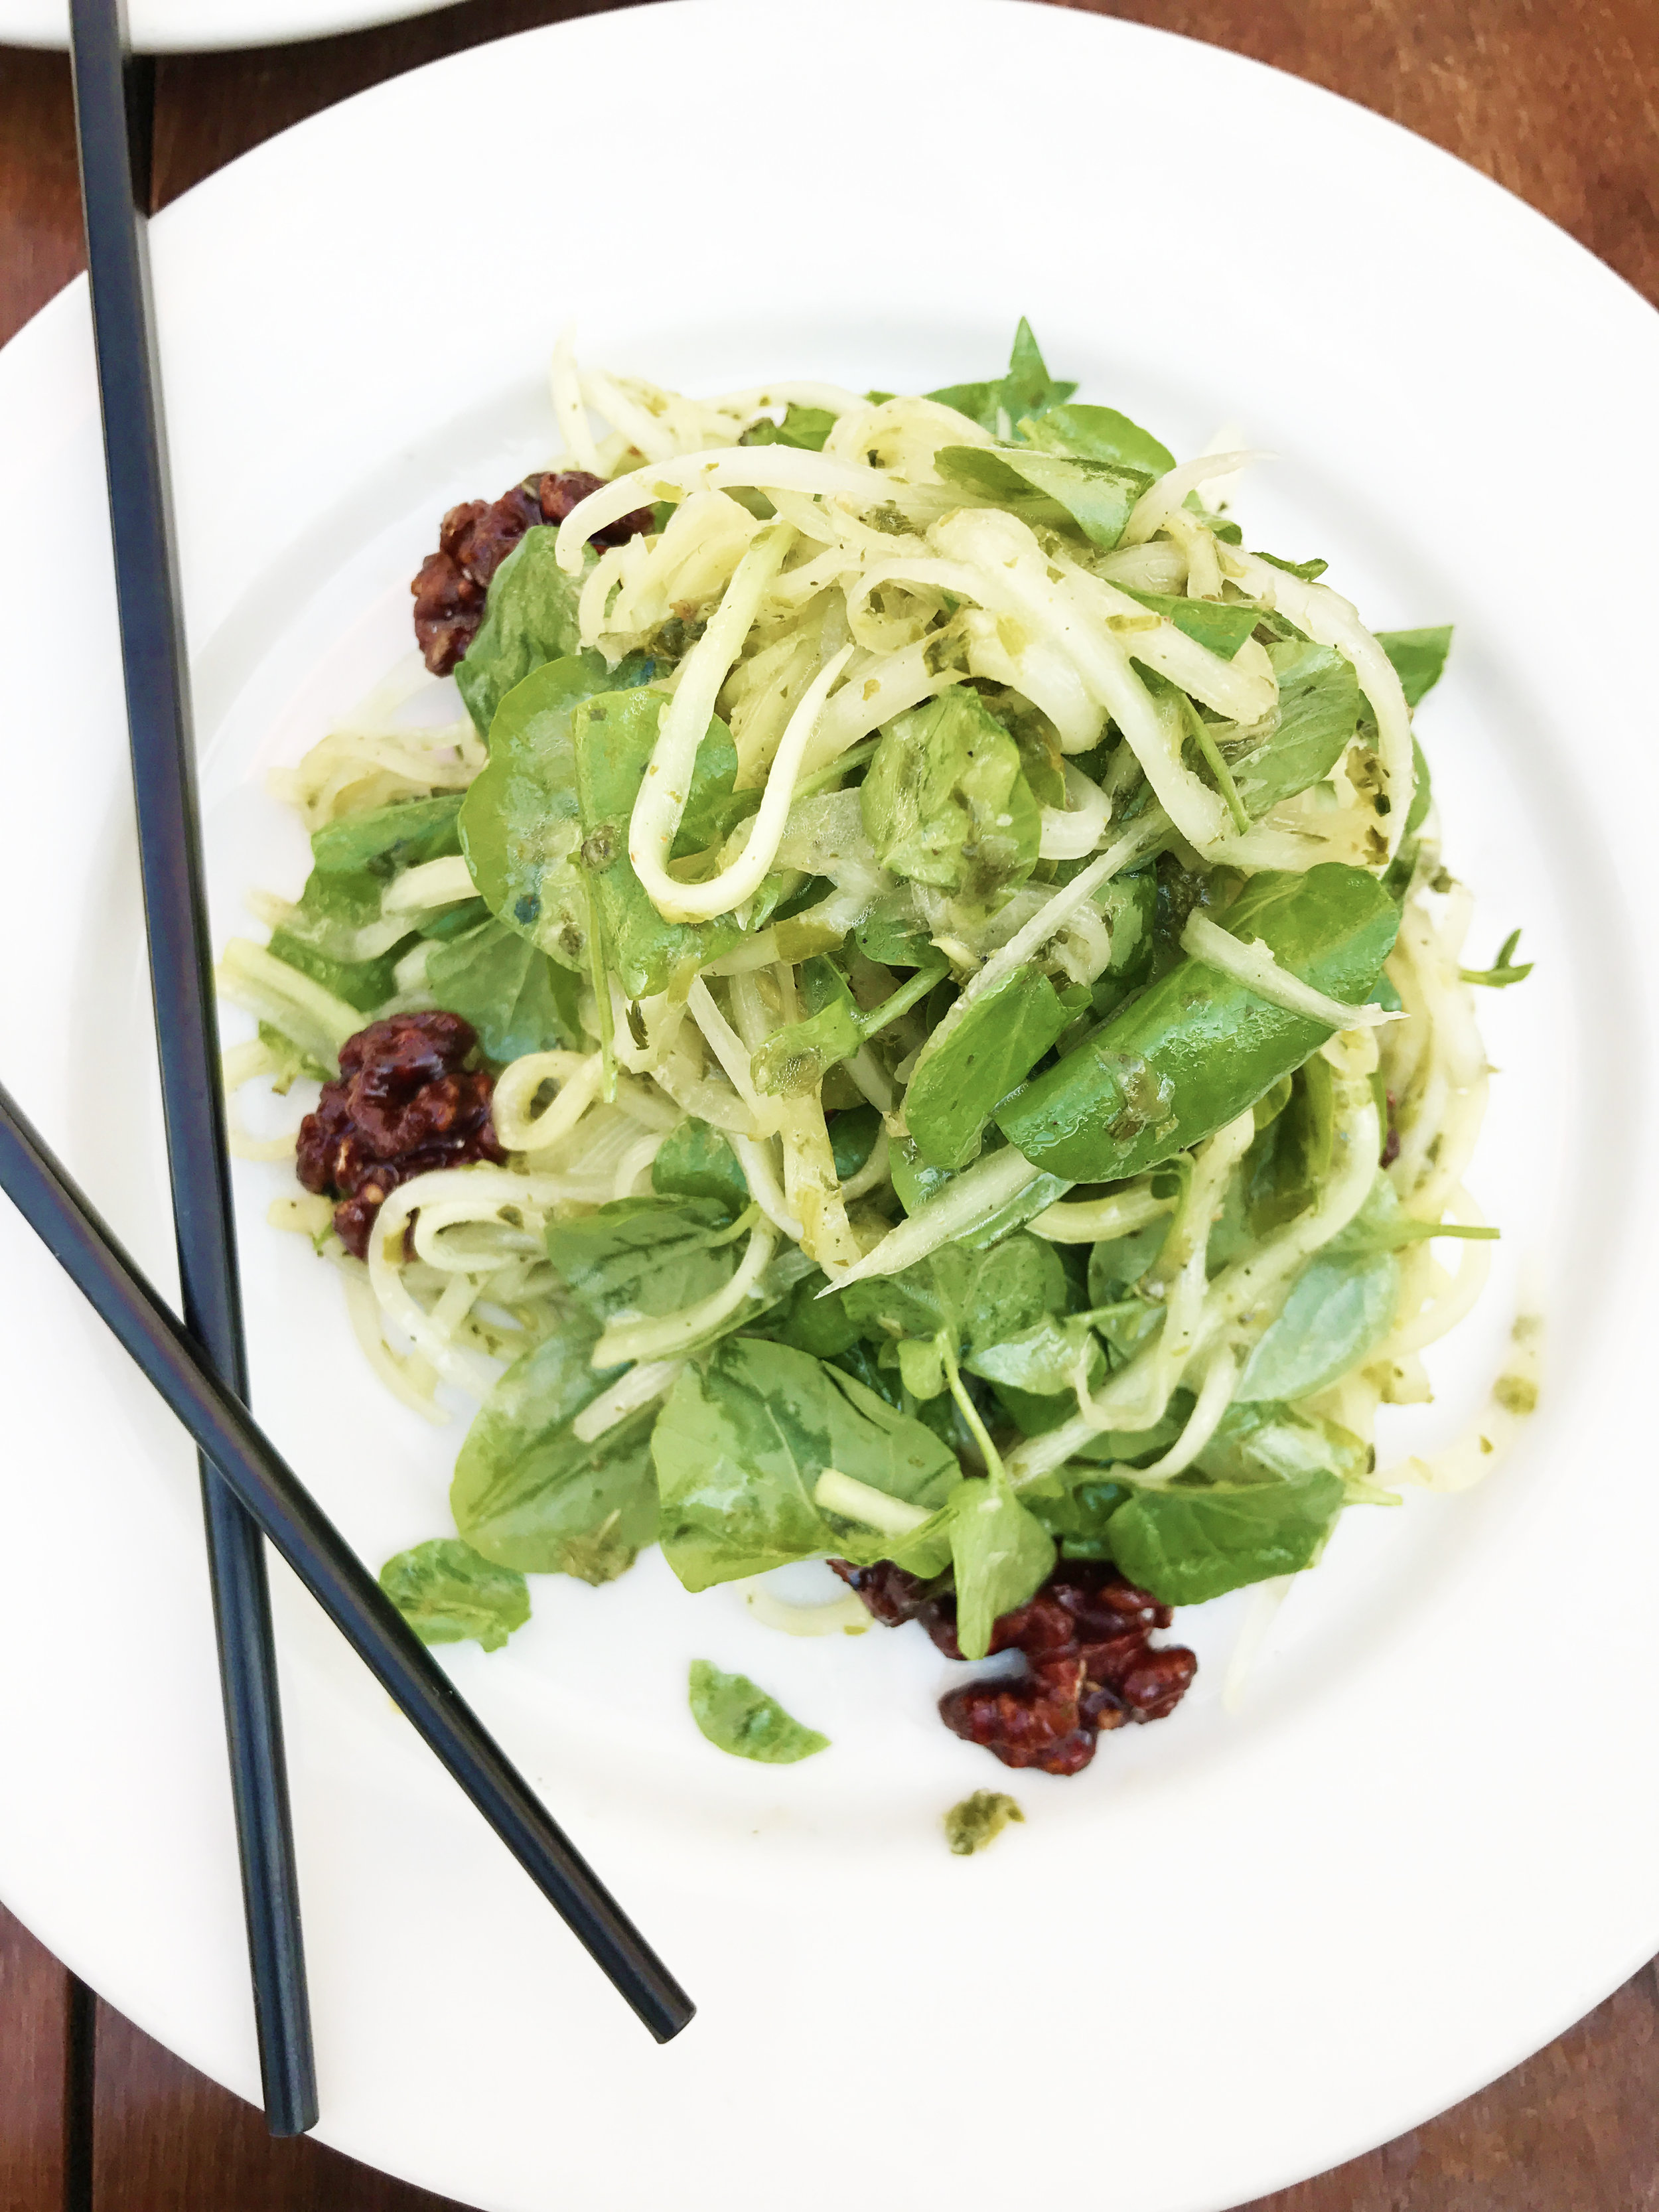 Green Papaya Salad with watercress and spice walnuts